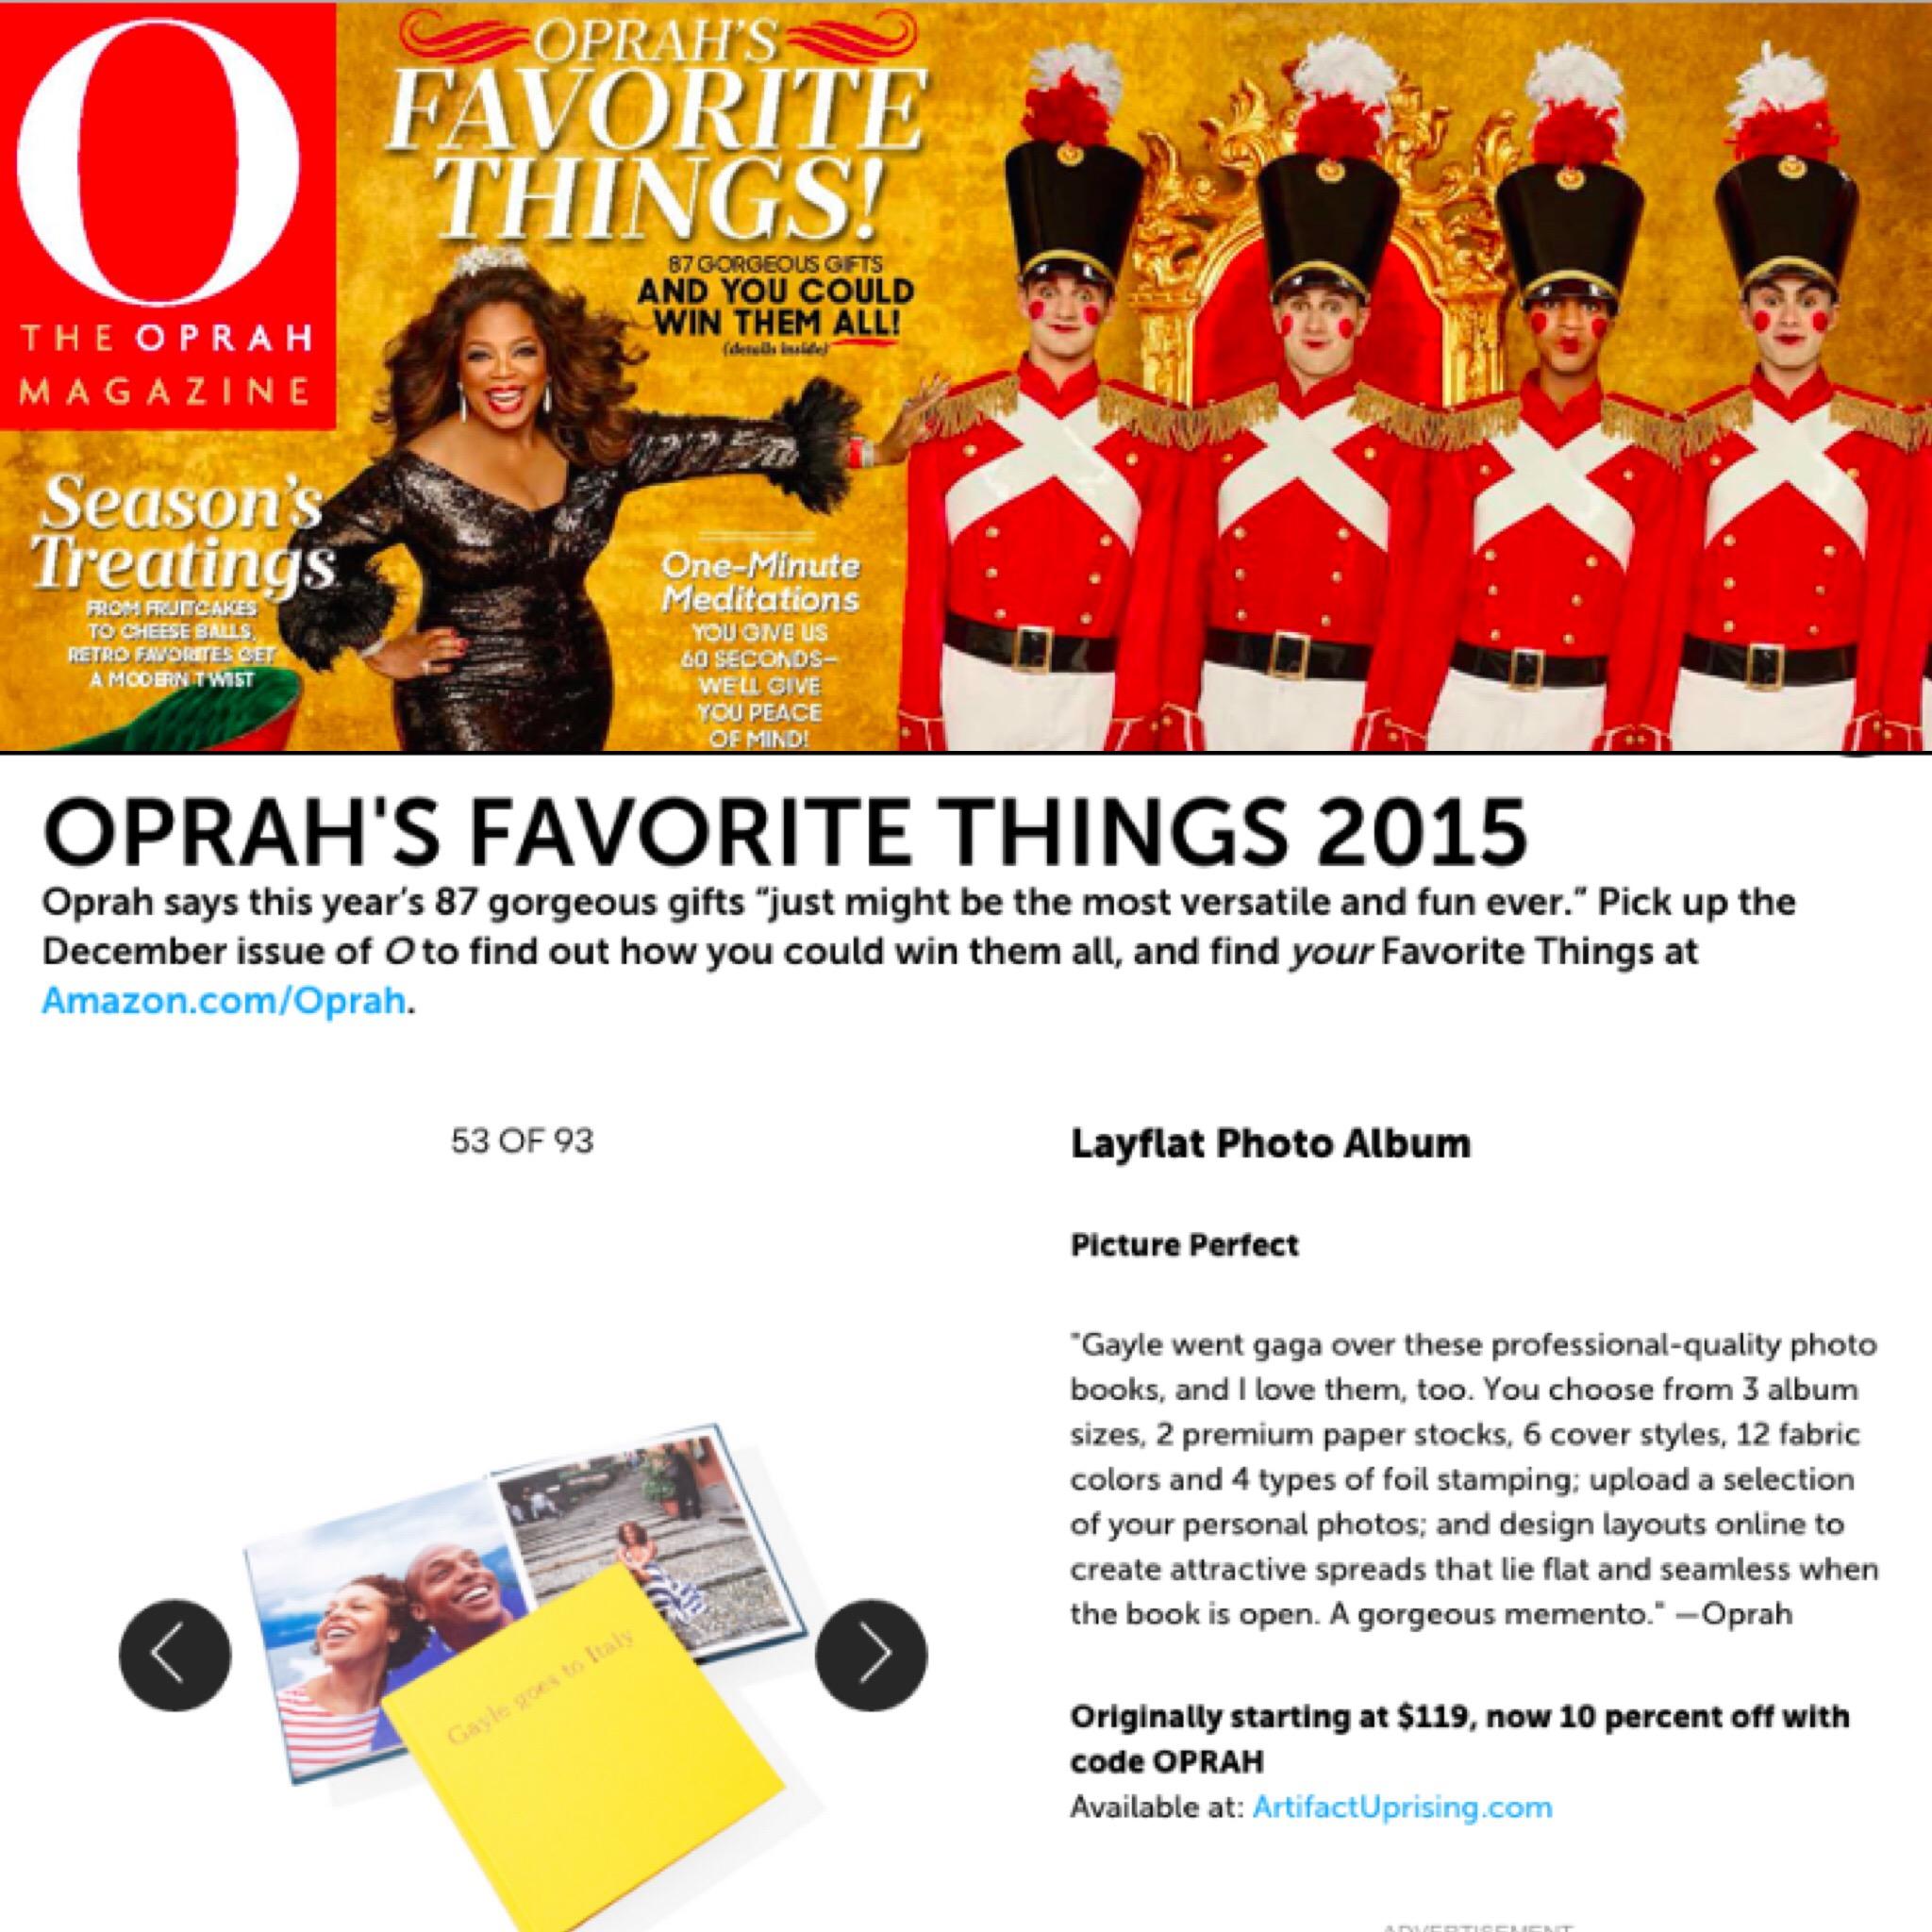 The Layflat Album from Artifact Uprising makes Oprah's Favorite Things List